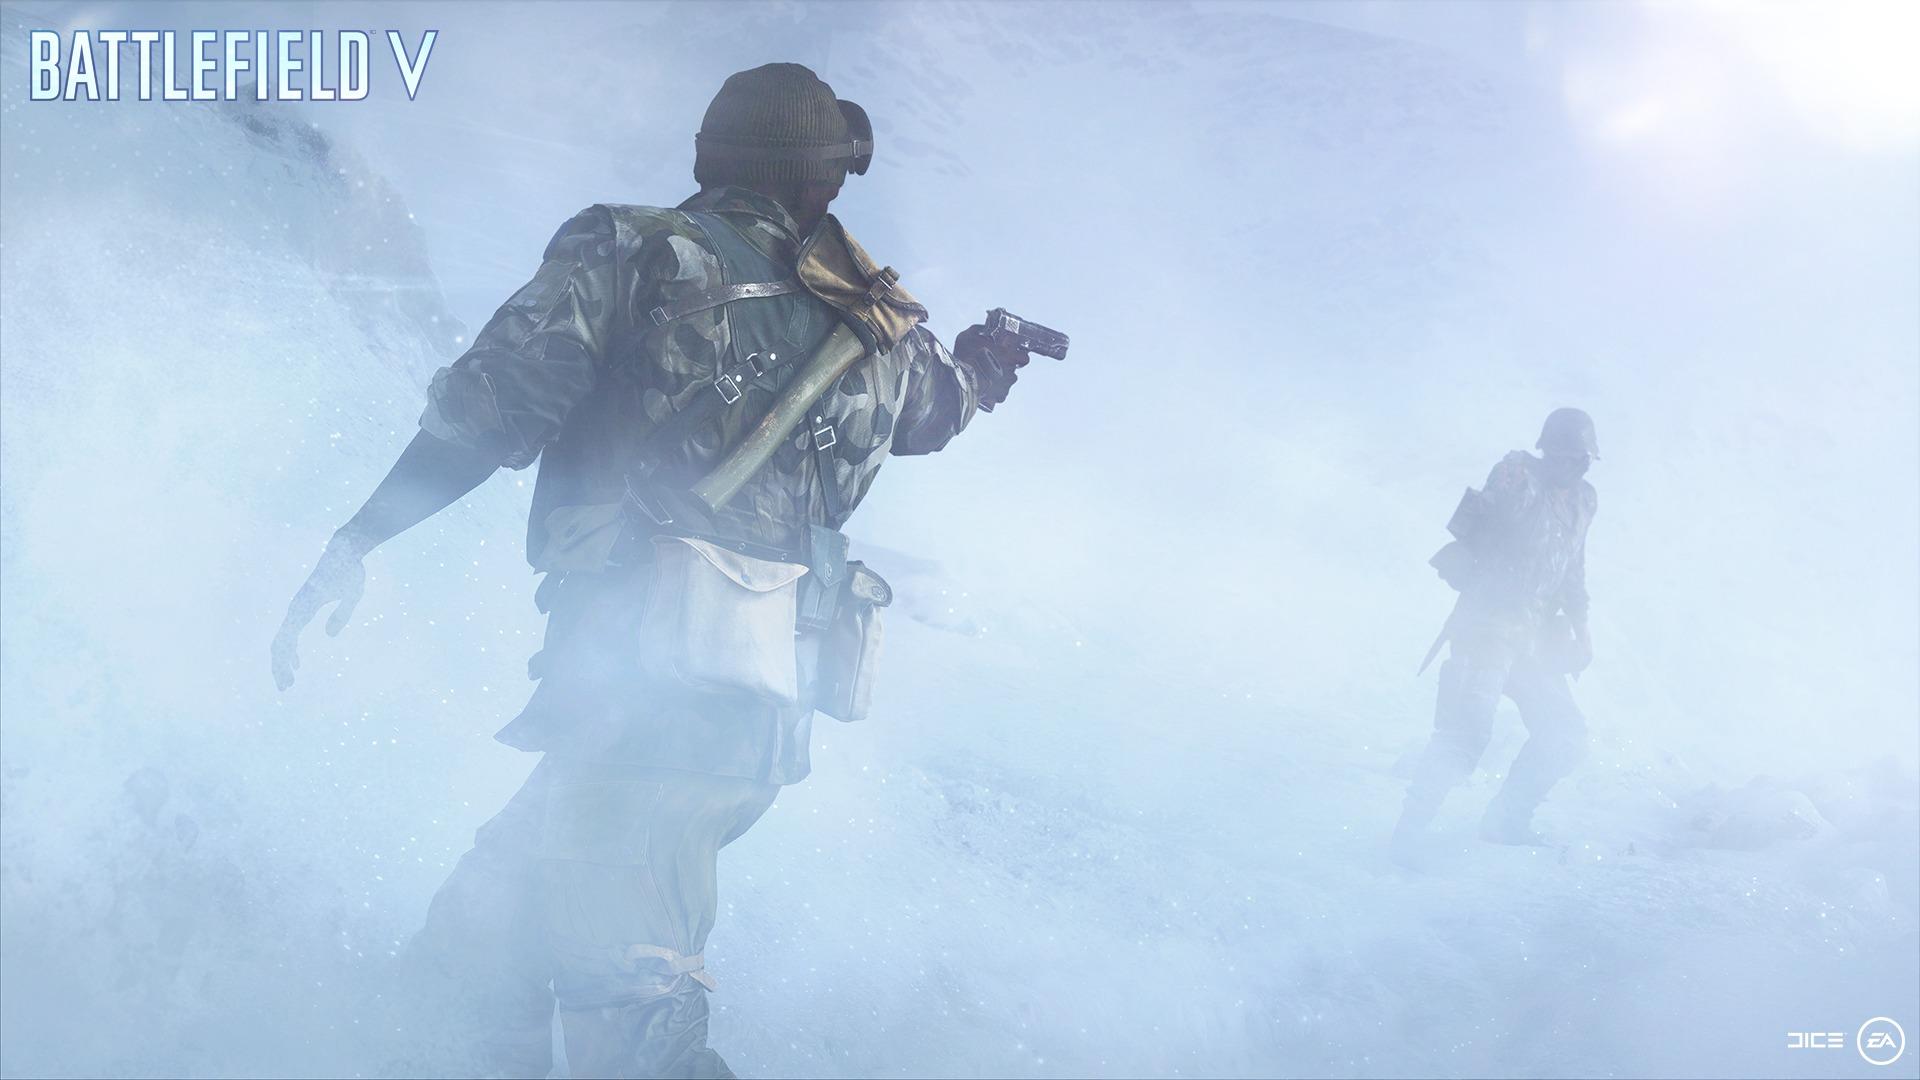 "Dice toner ned ""galskapen"" - lover autentisk tilpasning i ""Battlefield V""."